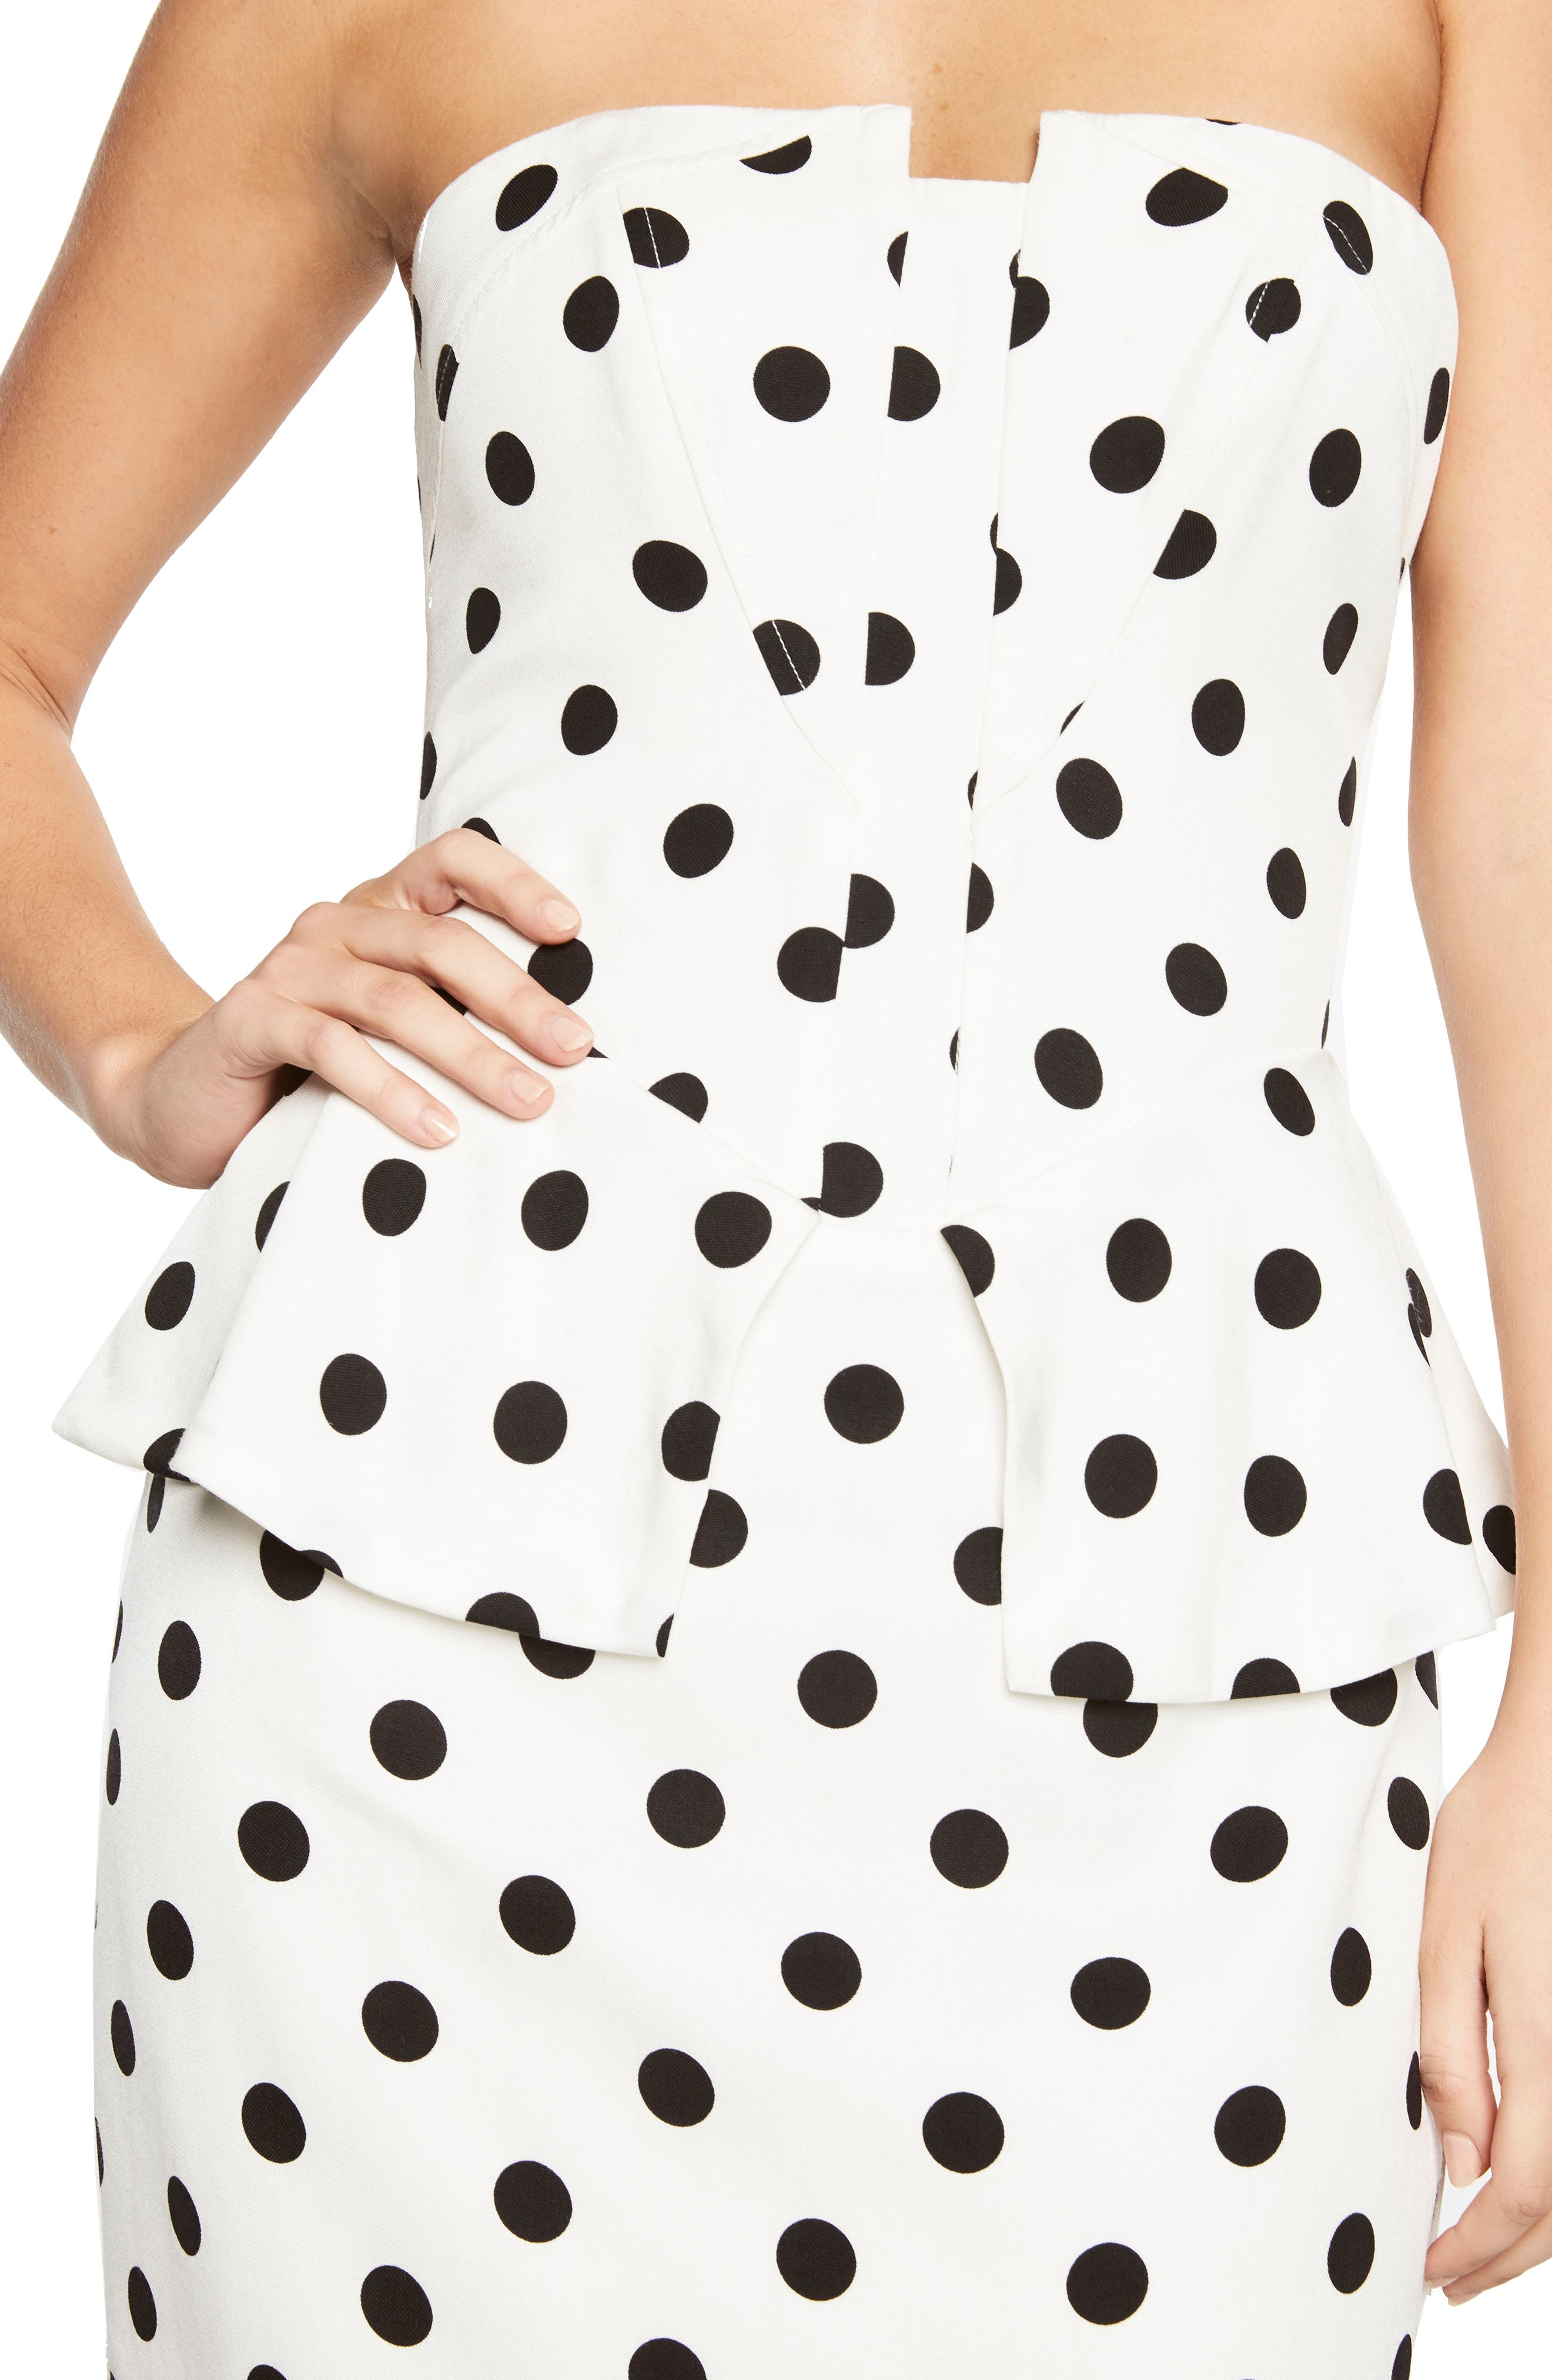 Suri Polka Dot Peplum Dress,                             Alternate thumbnail 5, color,                             White Spot